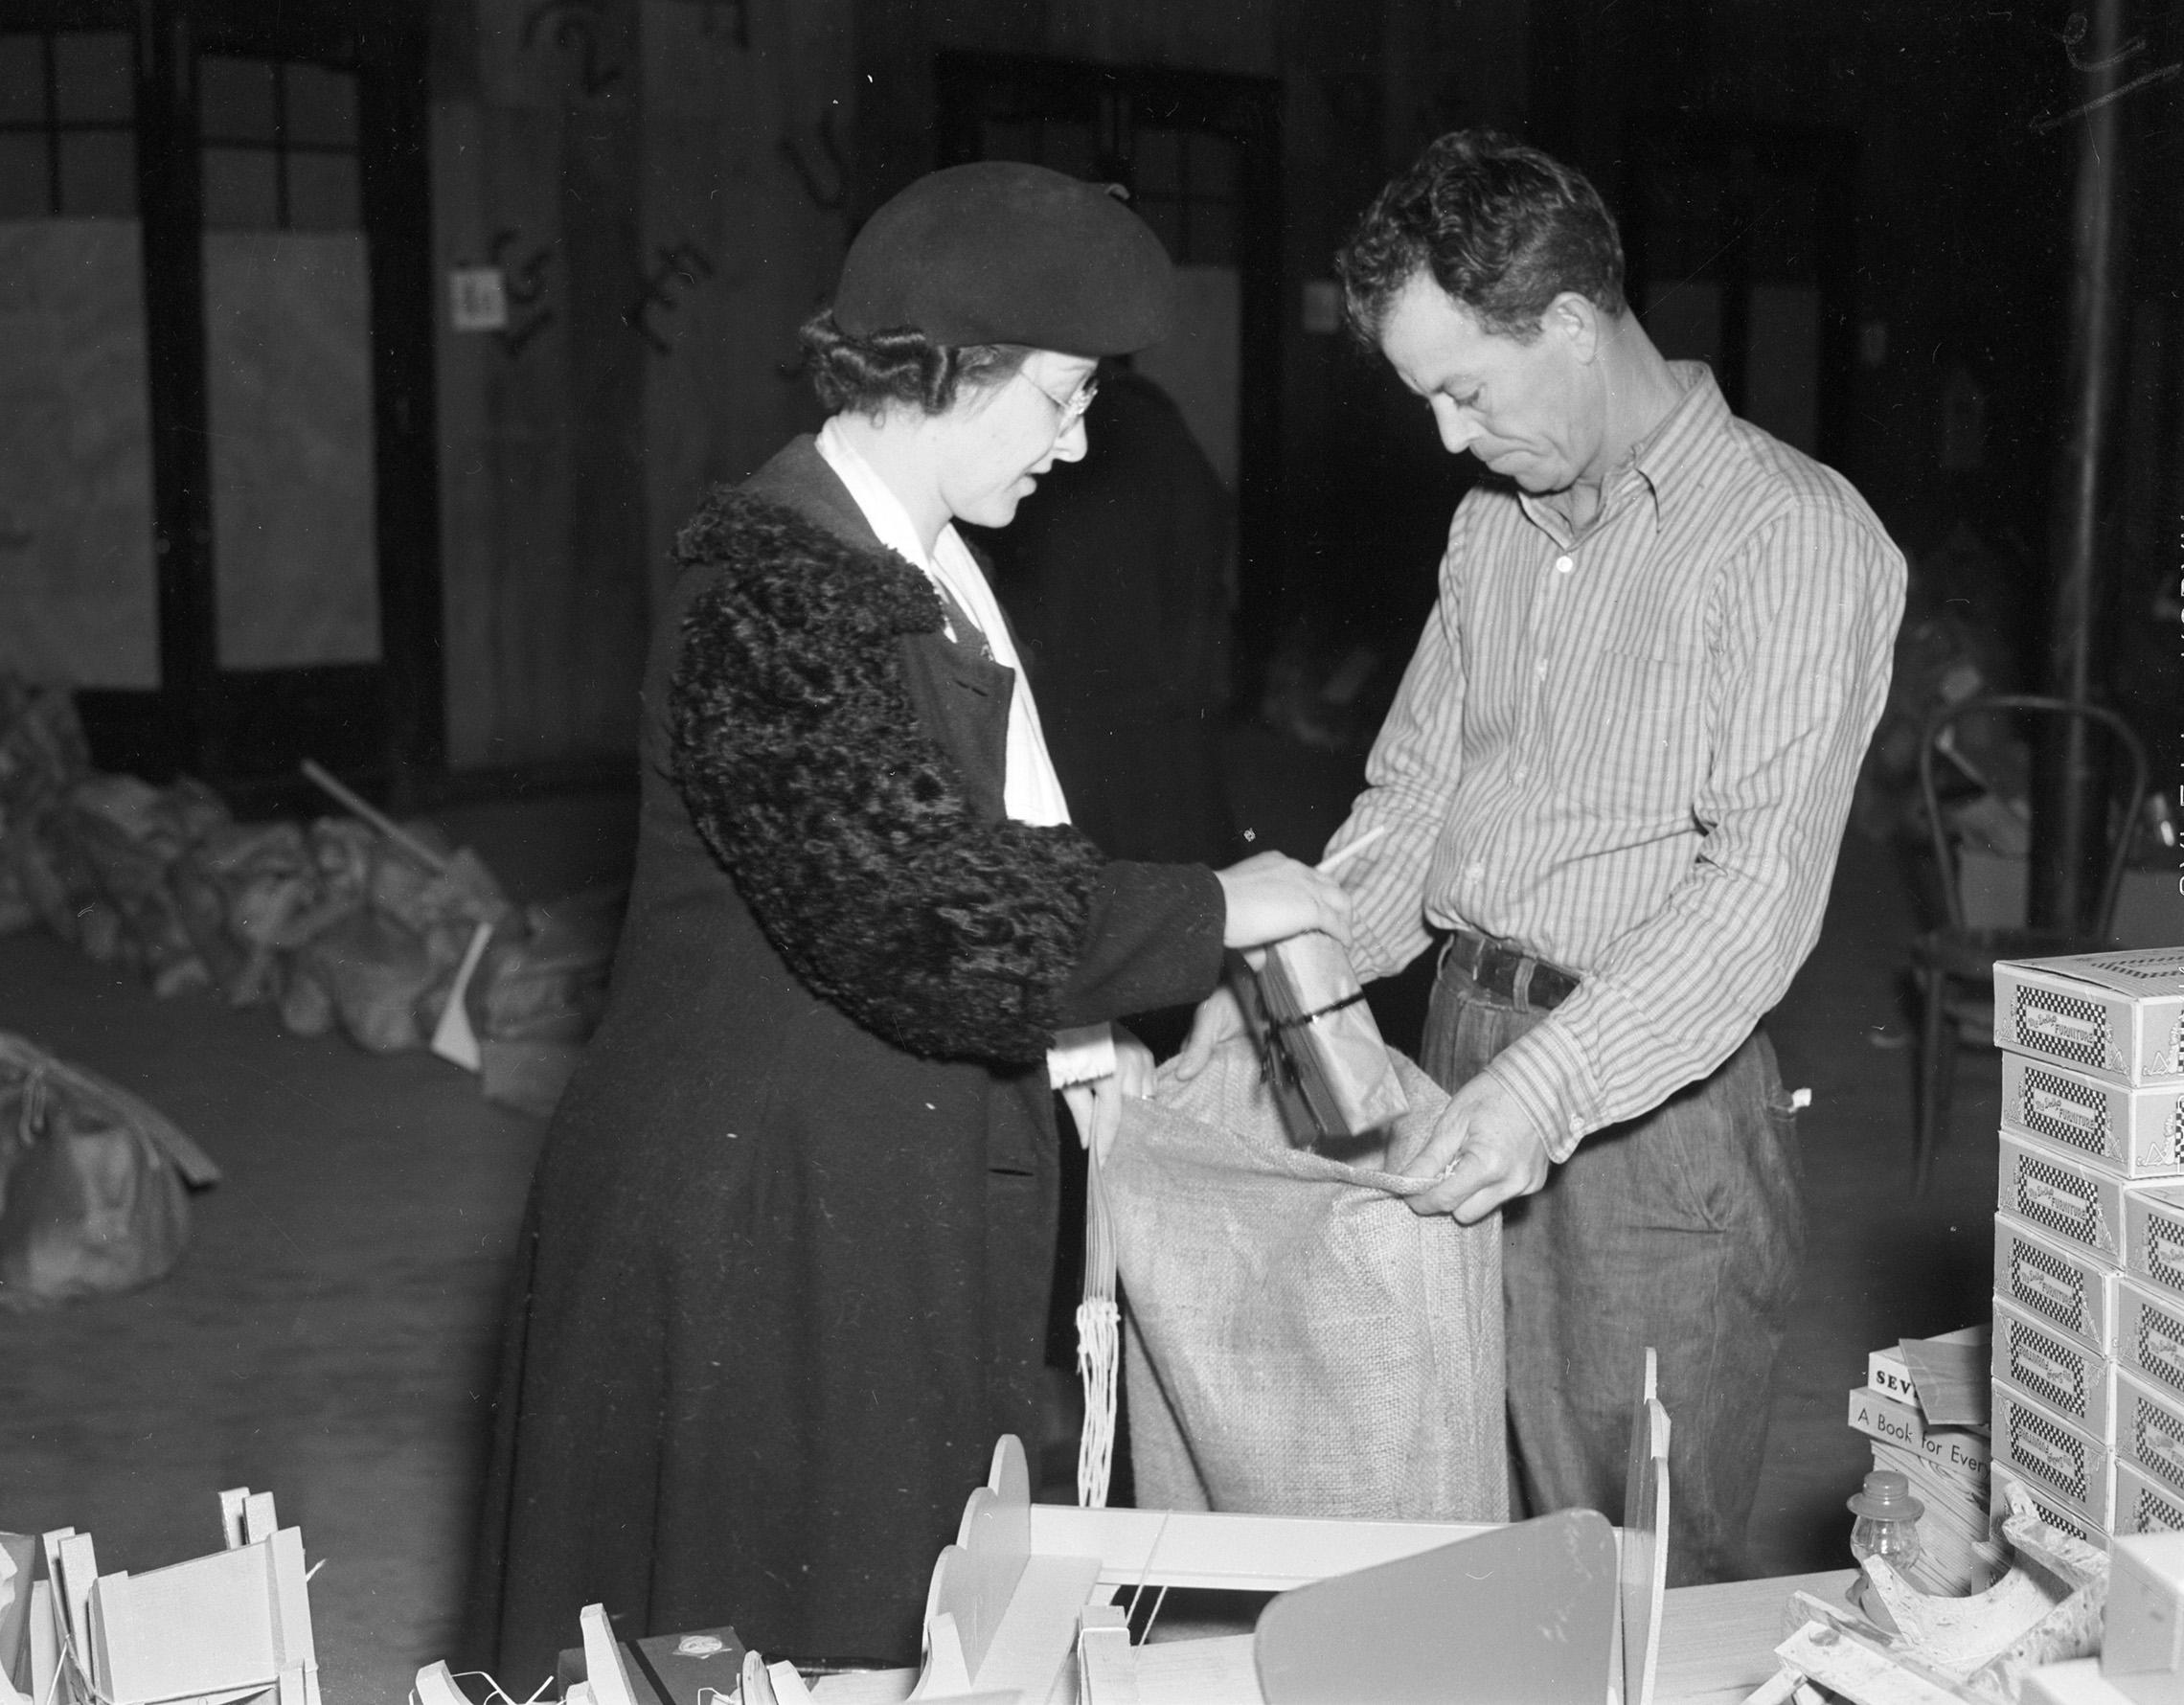 Goodfellow_Lady Bag_1937.jpg